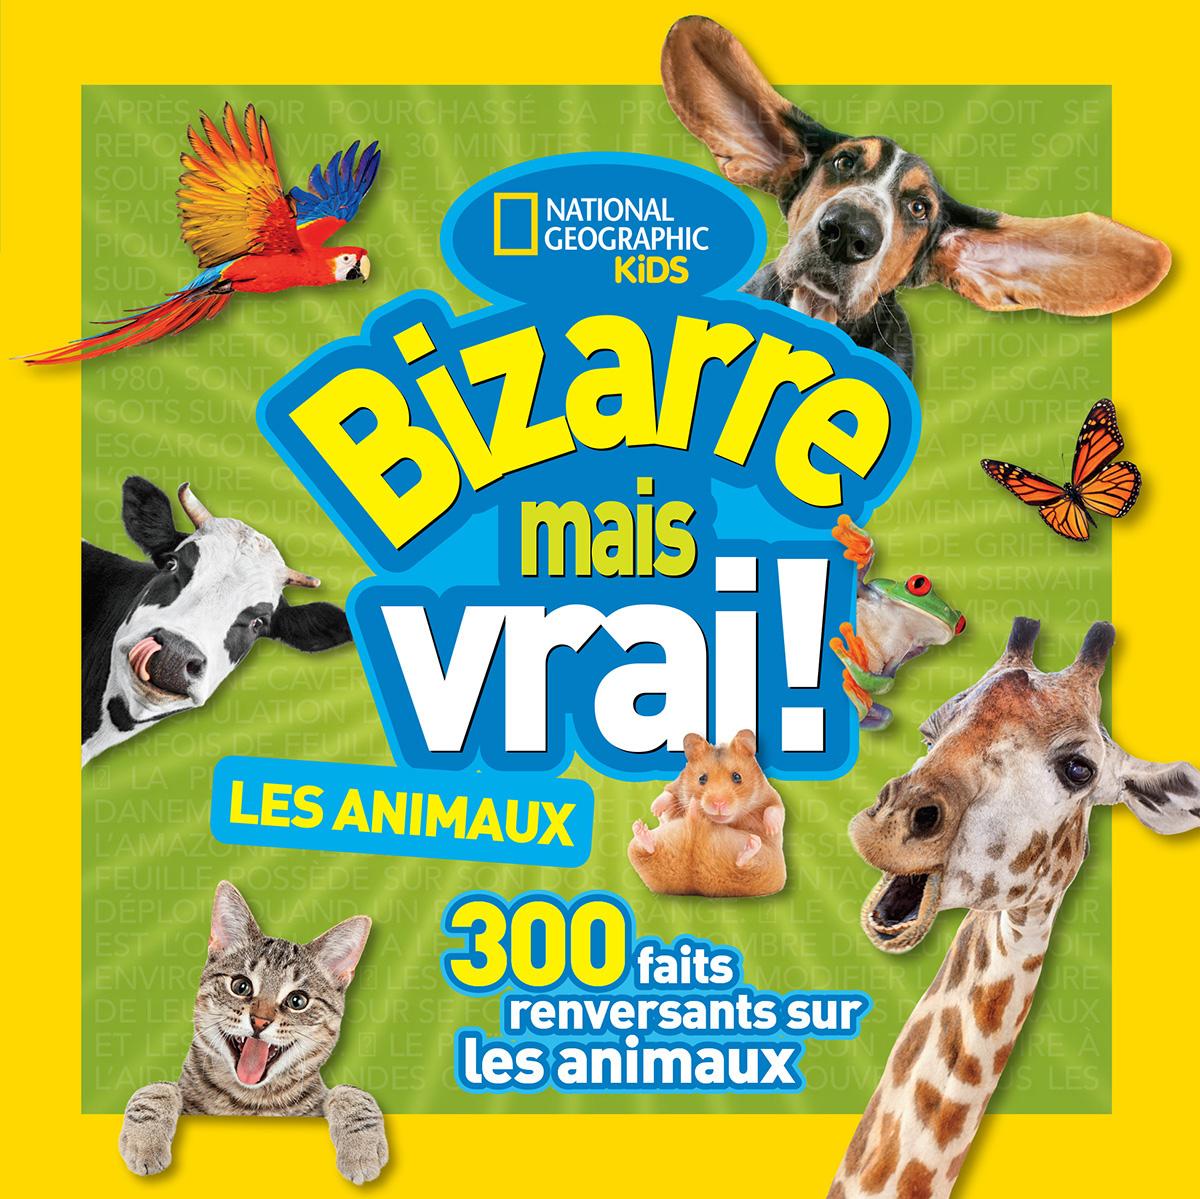 National Geographic Kids : Bizarre mais vrai! Les animaux